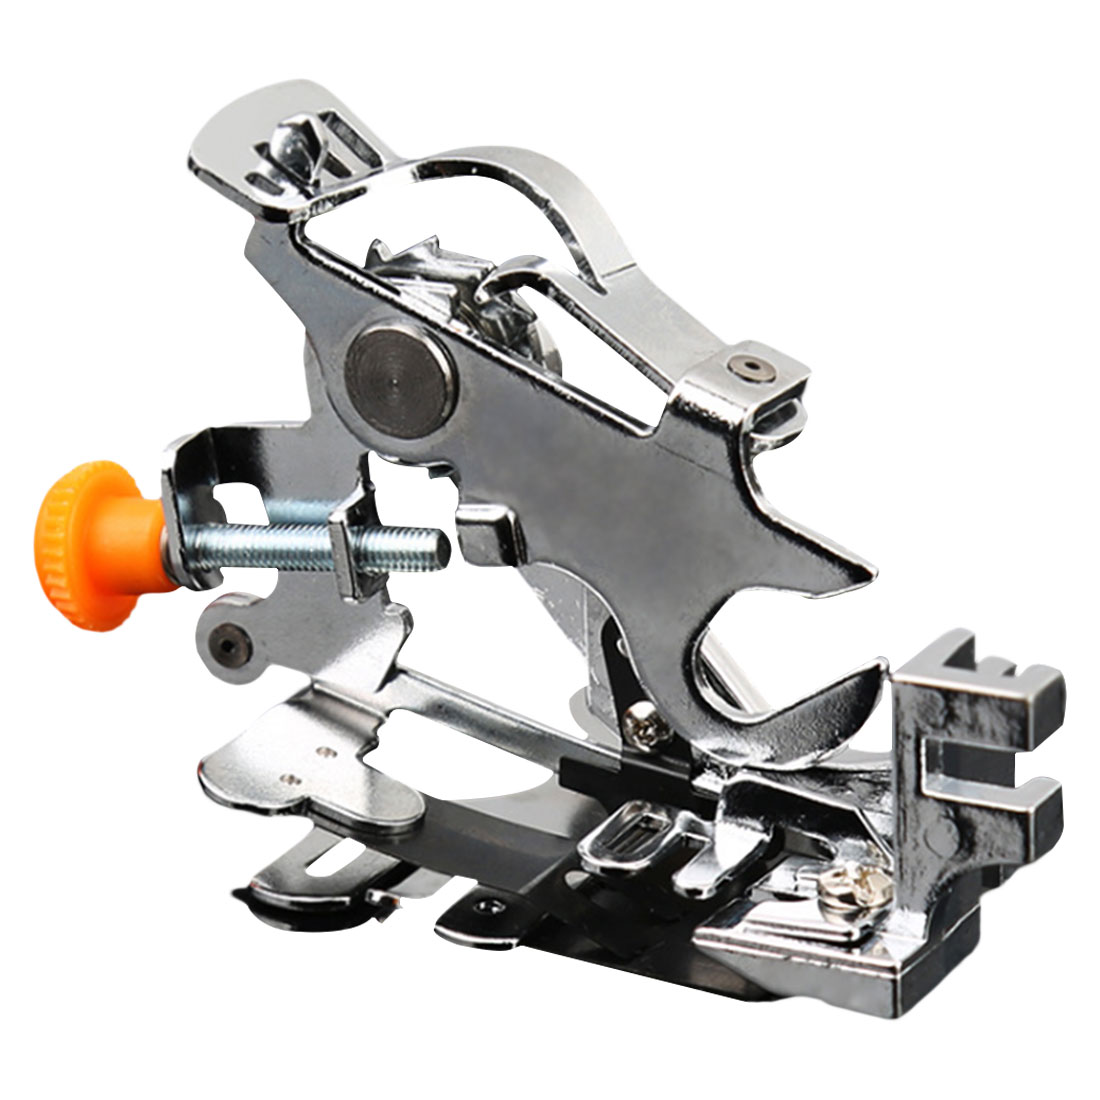 Presser Foot Ruffler Sewing Machine Presser Foot Ruffler Foot Presser Feet Low Shank